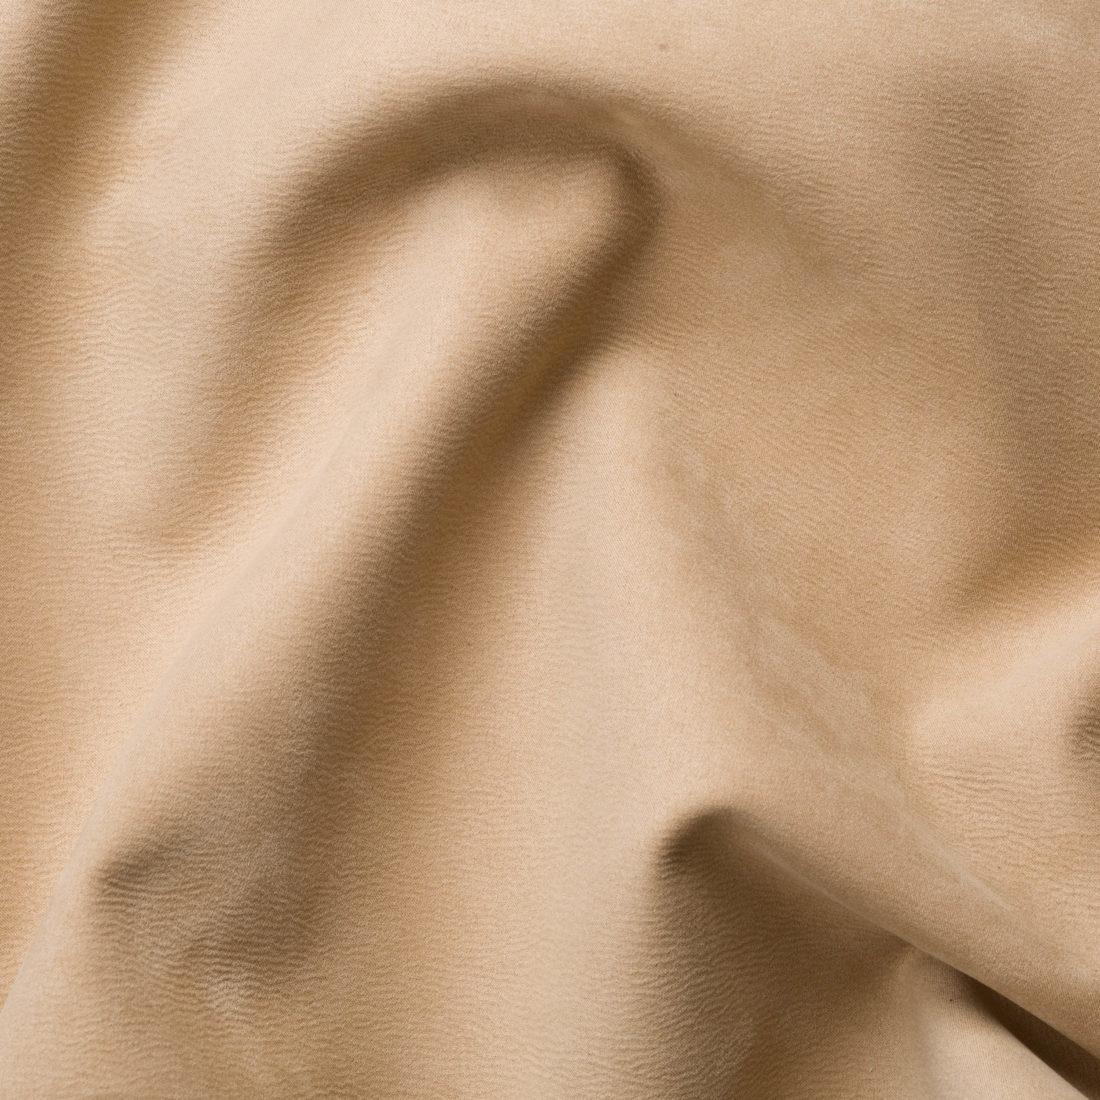 Меблева тканина Diva 106 Camel, штучна замша